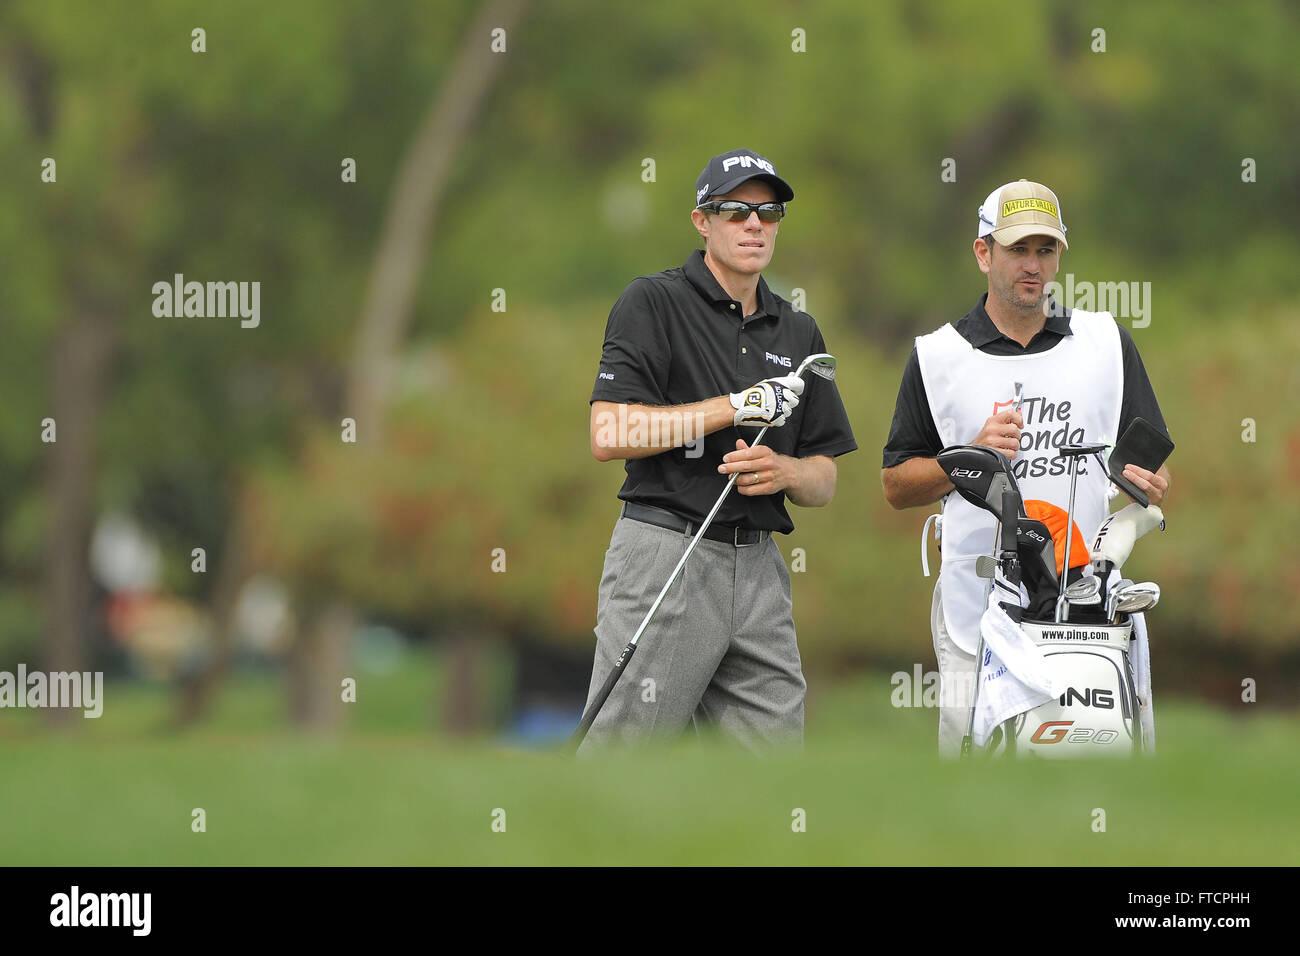 March 2, 2012 - Palm Beach Gardens, Fla, USA - Nick O\'Hearn and his ...